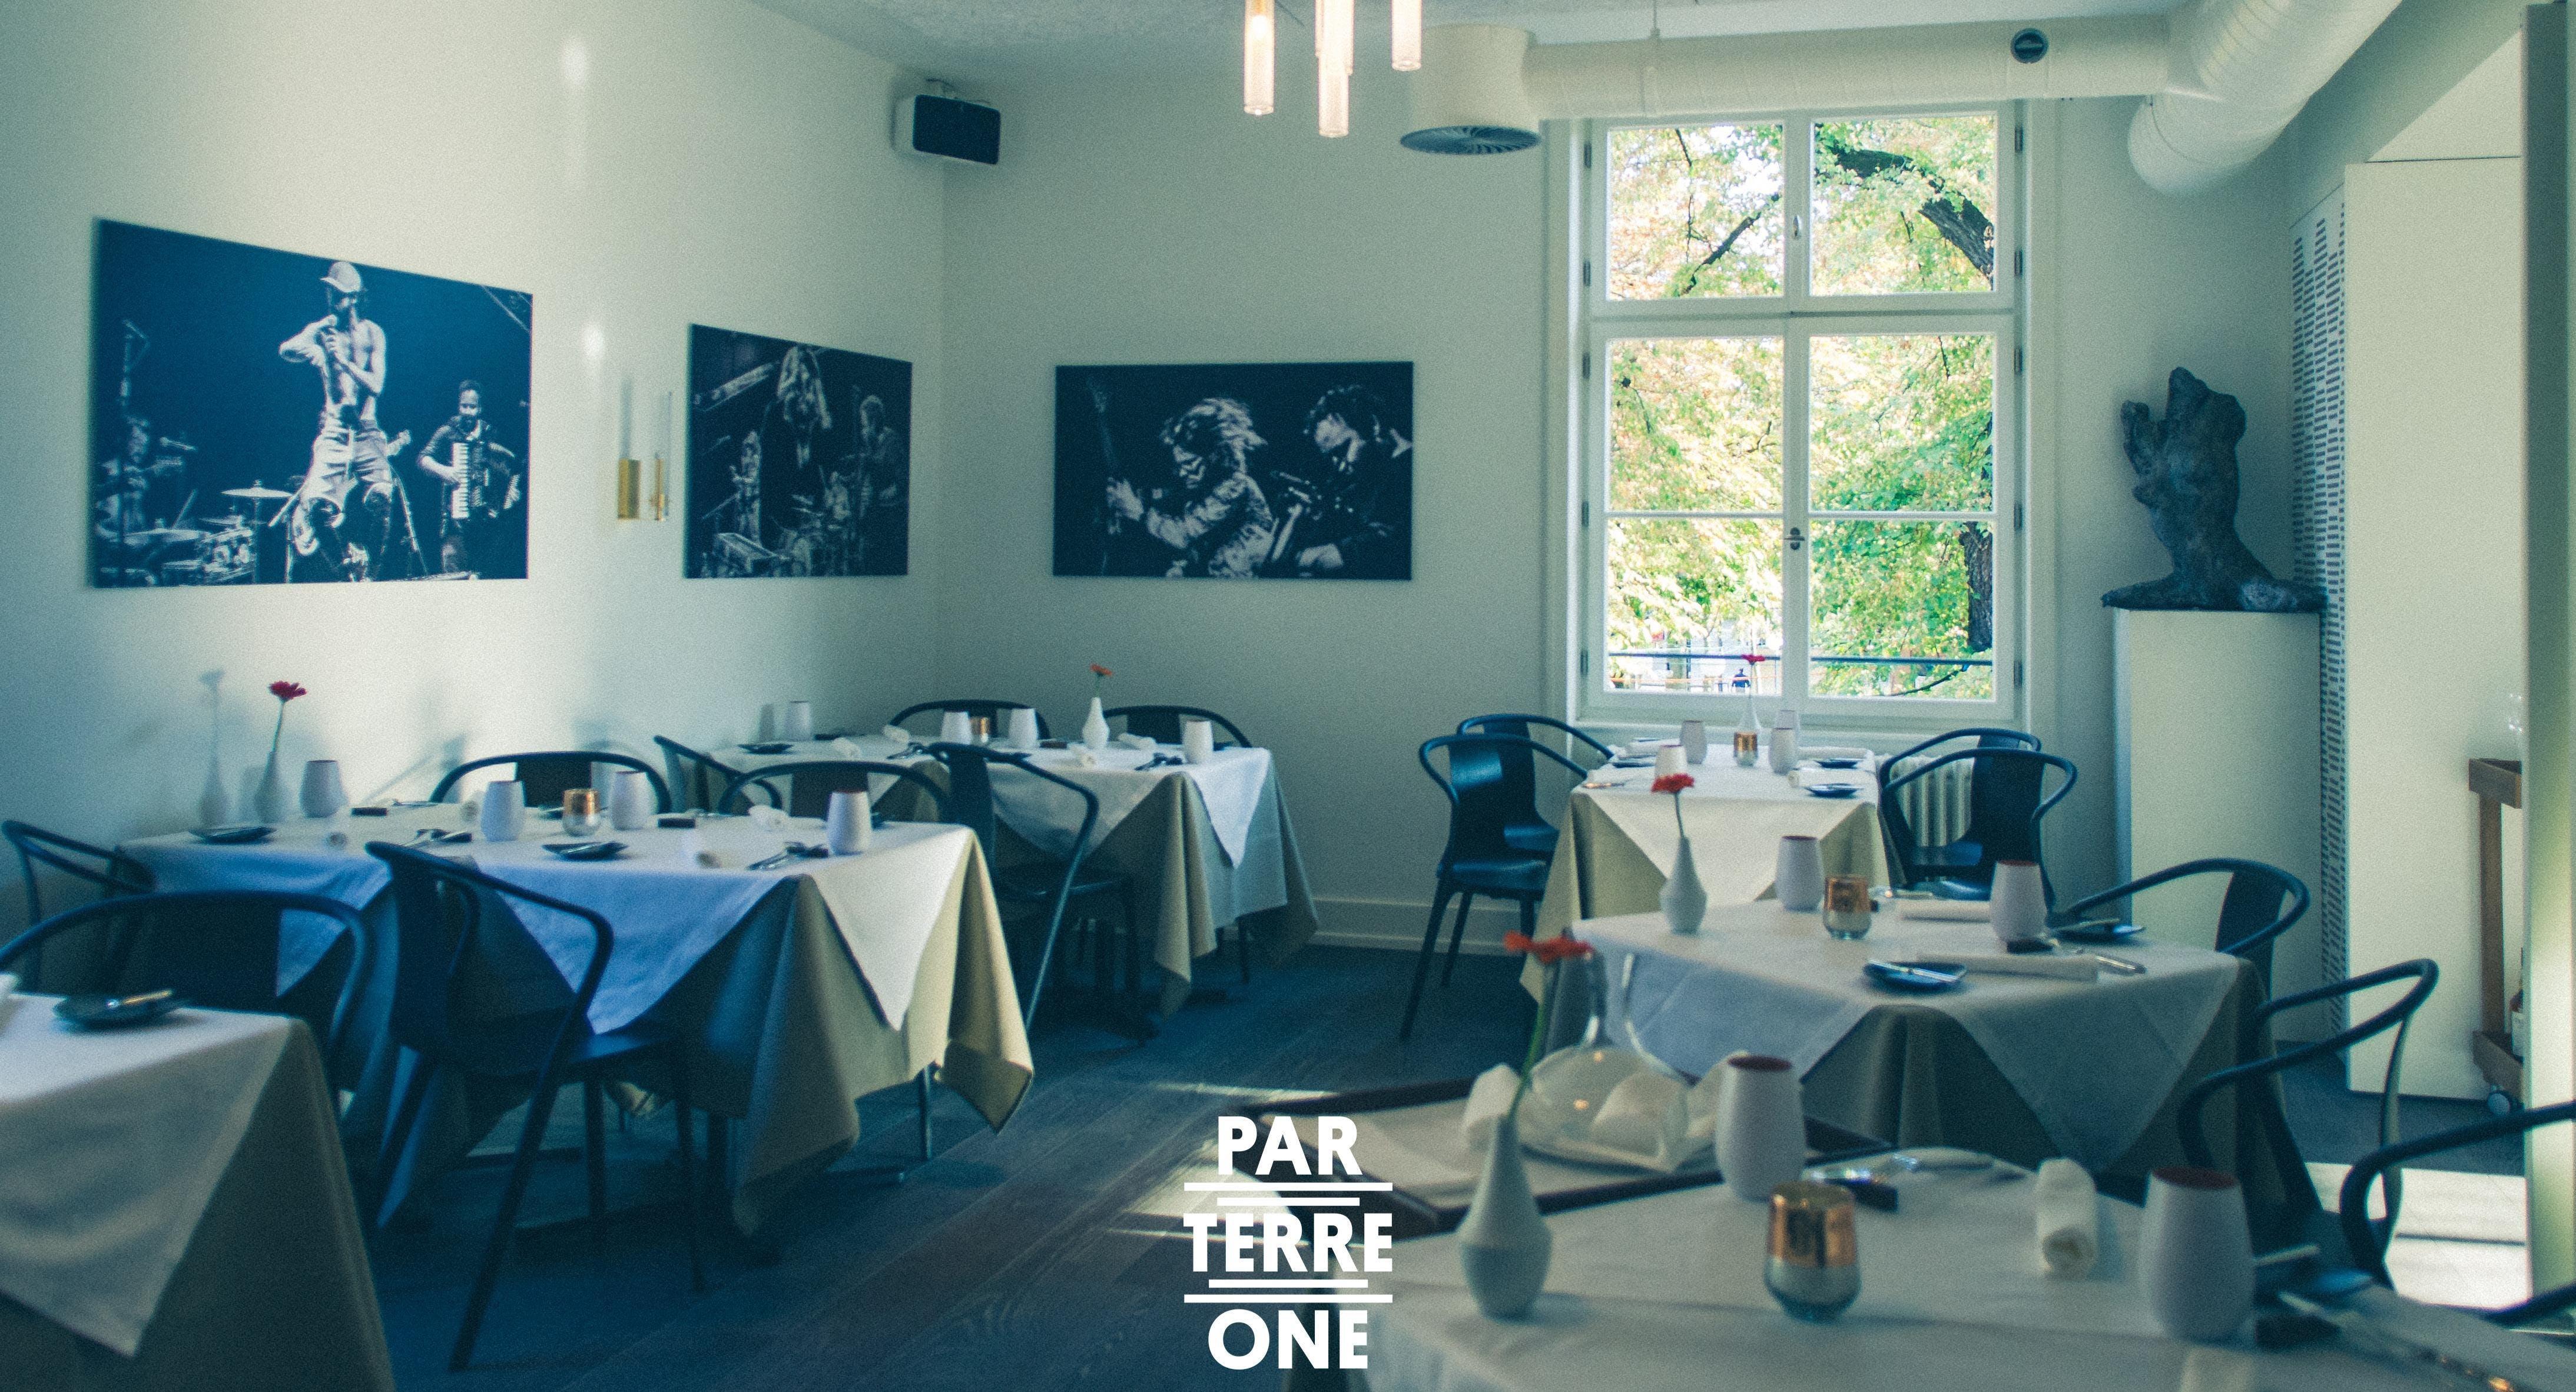 Parterre One Basel image 1